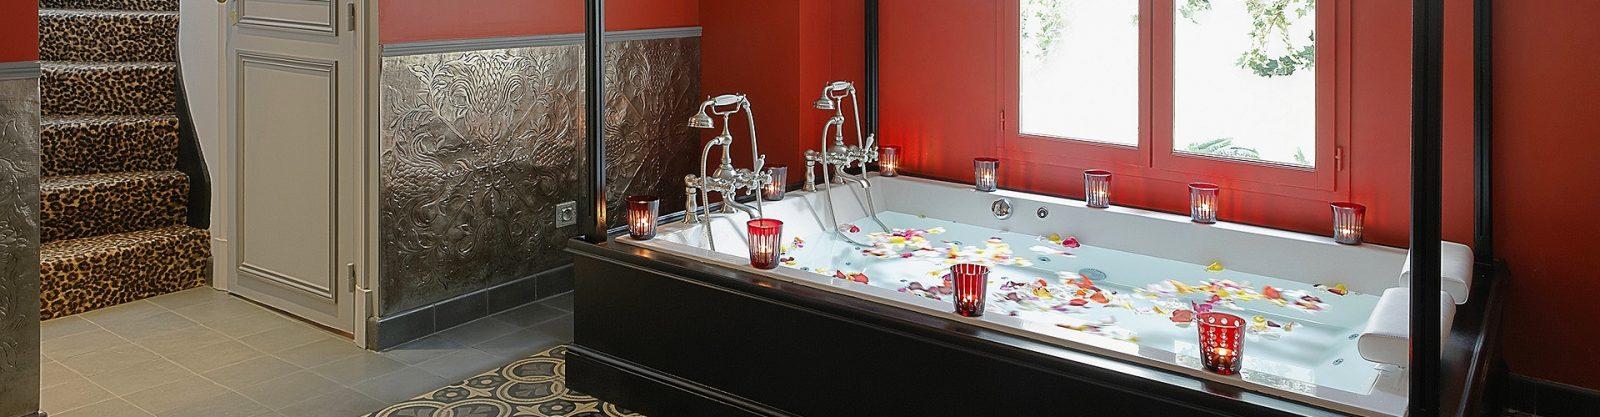 header hotel privatif paris pavillon d'amour villa privative